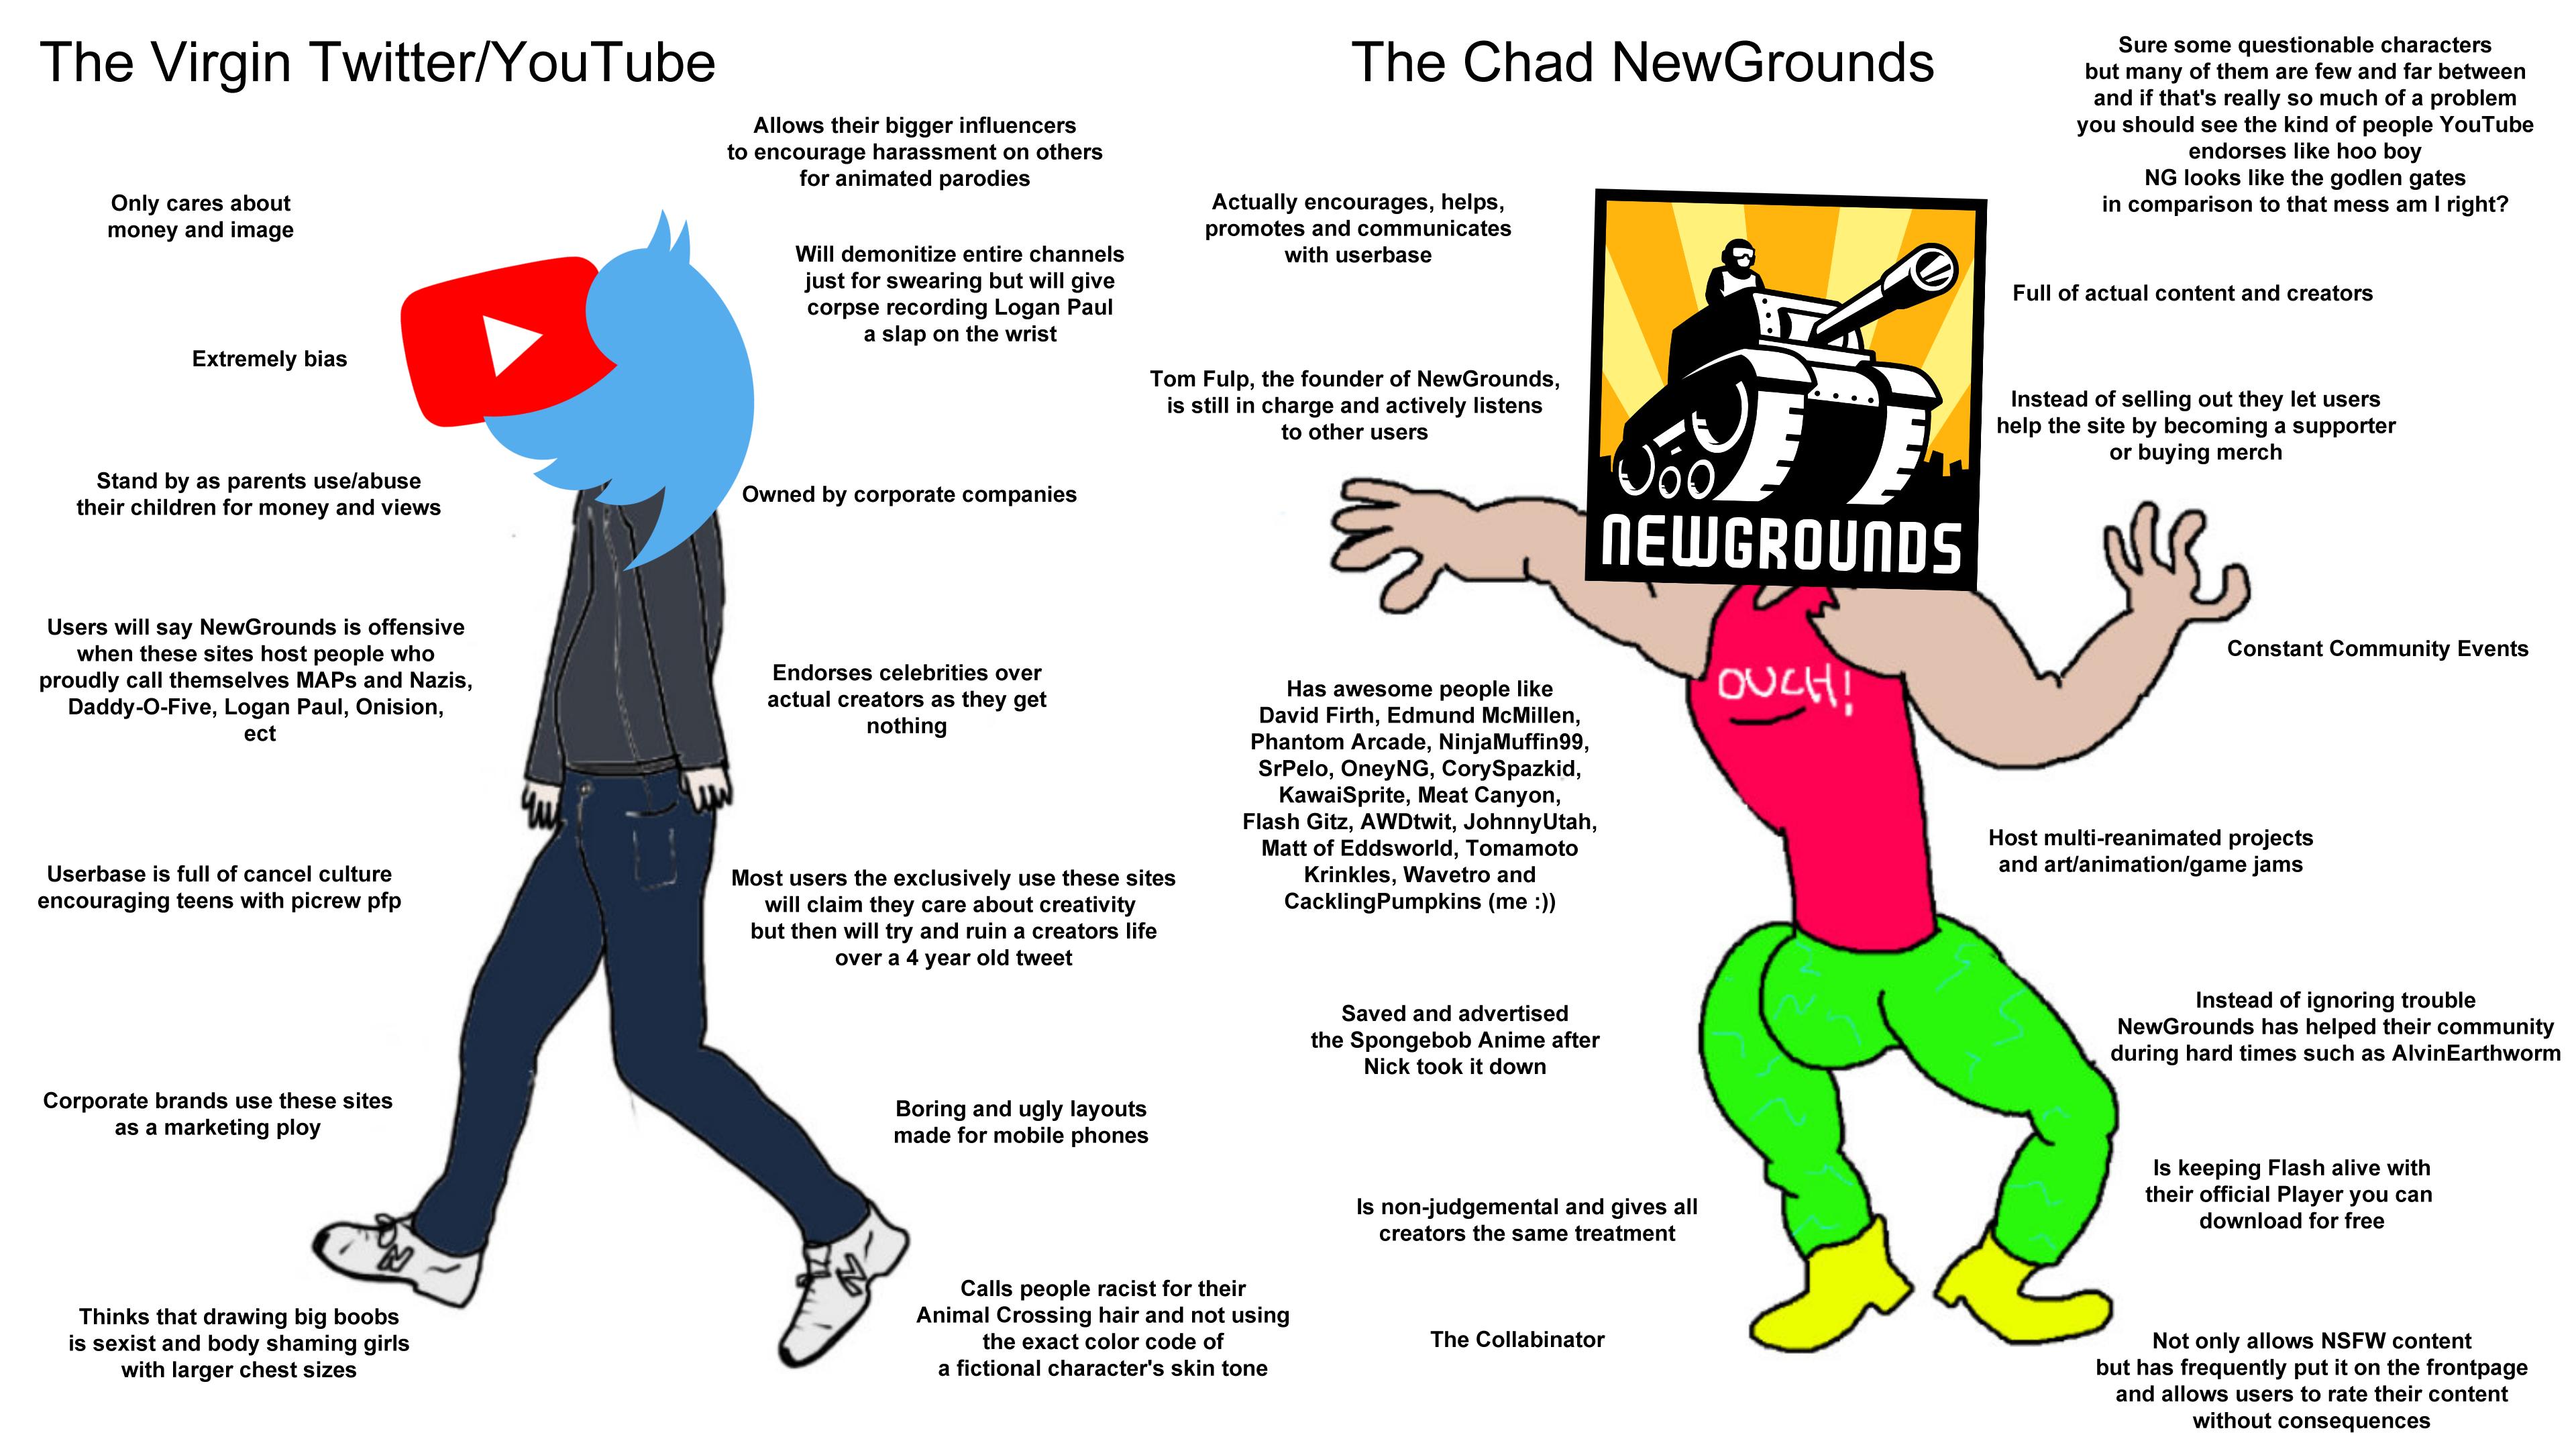 Vrgin Twitter/YouTube VS Chad NewGrounds